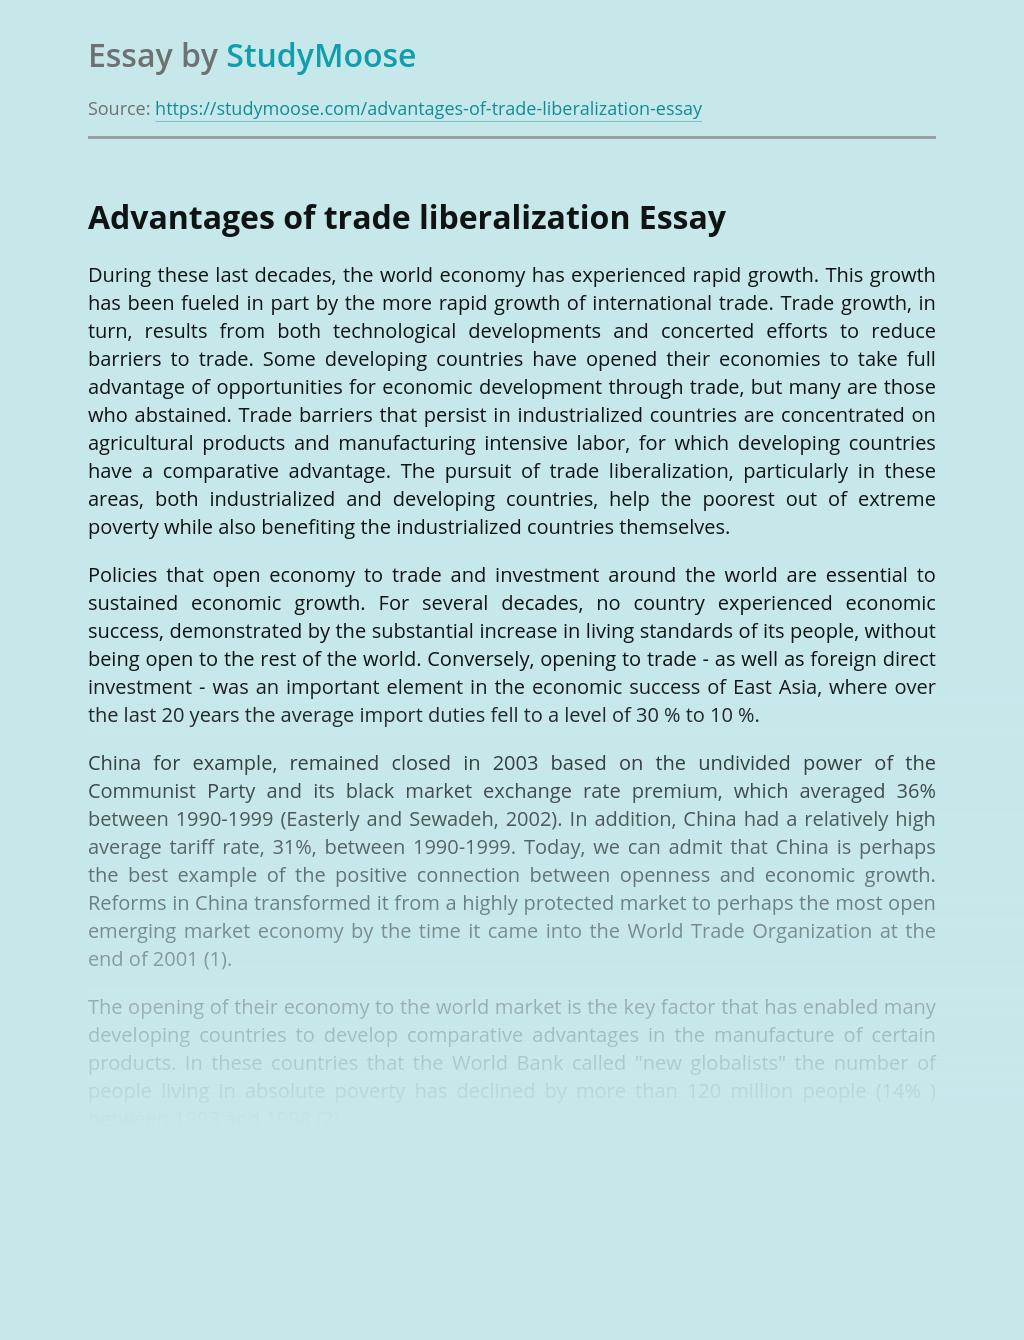 Advantages of trade liberalization